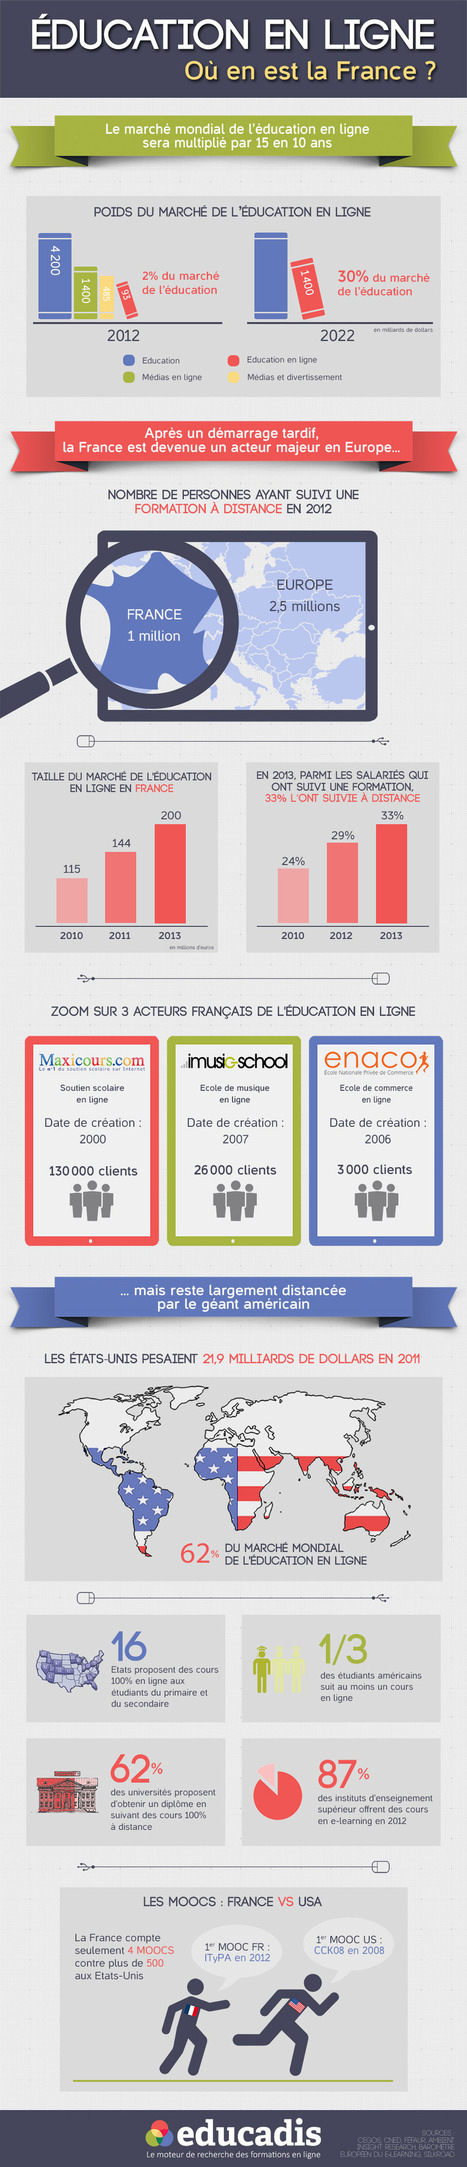 Infographie: Éducation en ligne en France | Time to Learn | Scoop.it